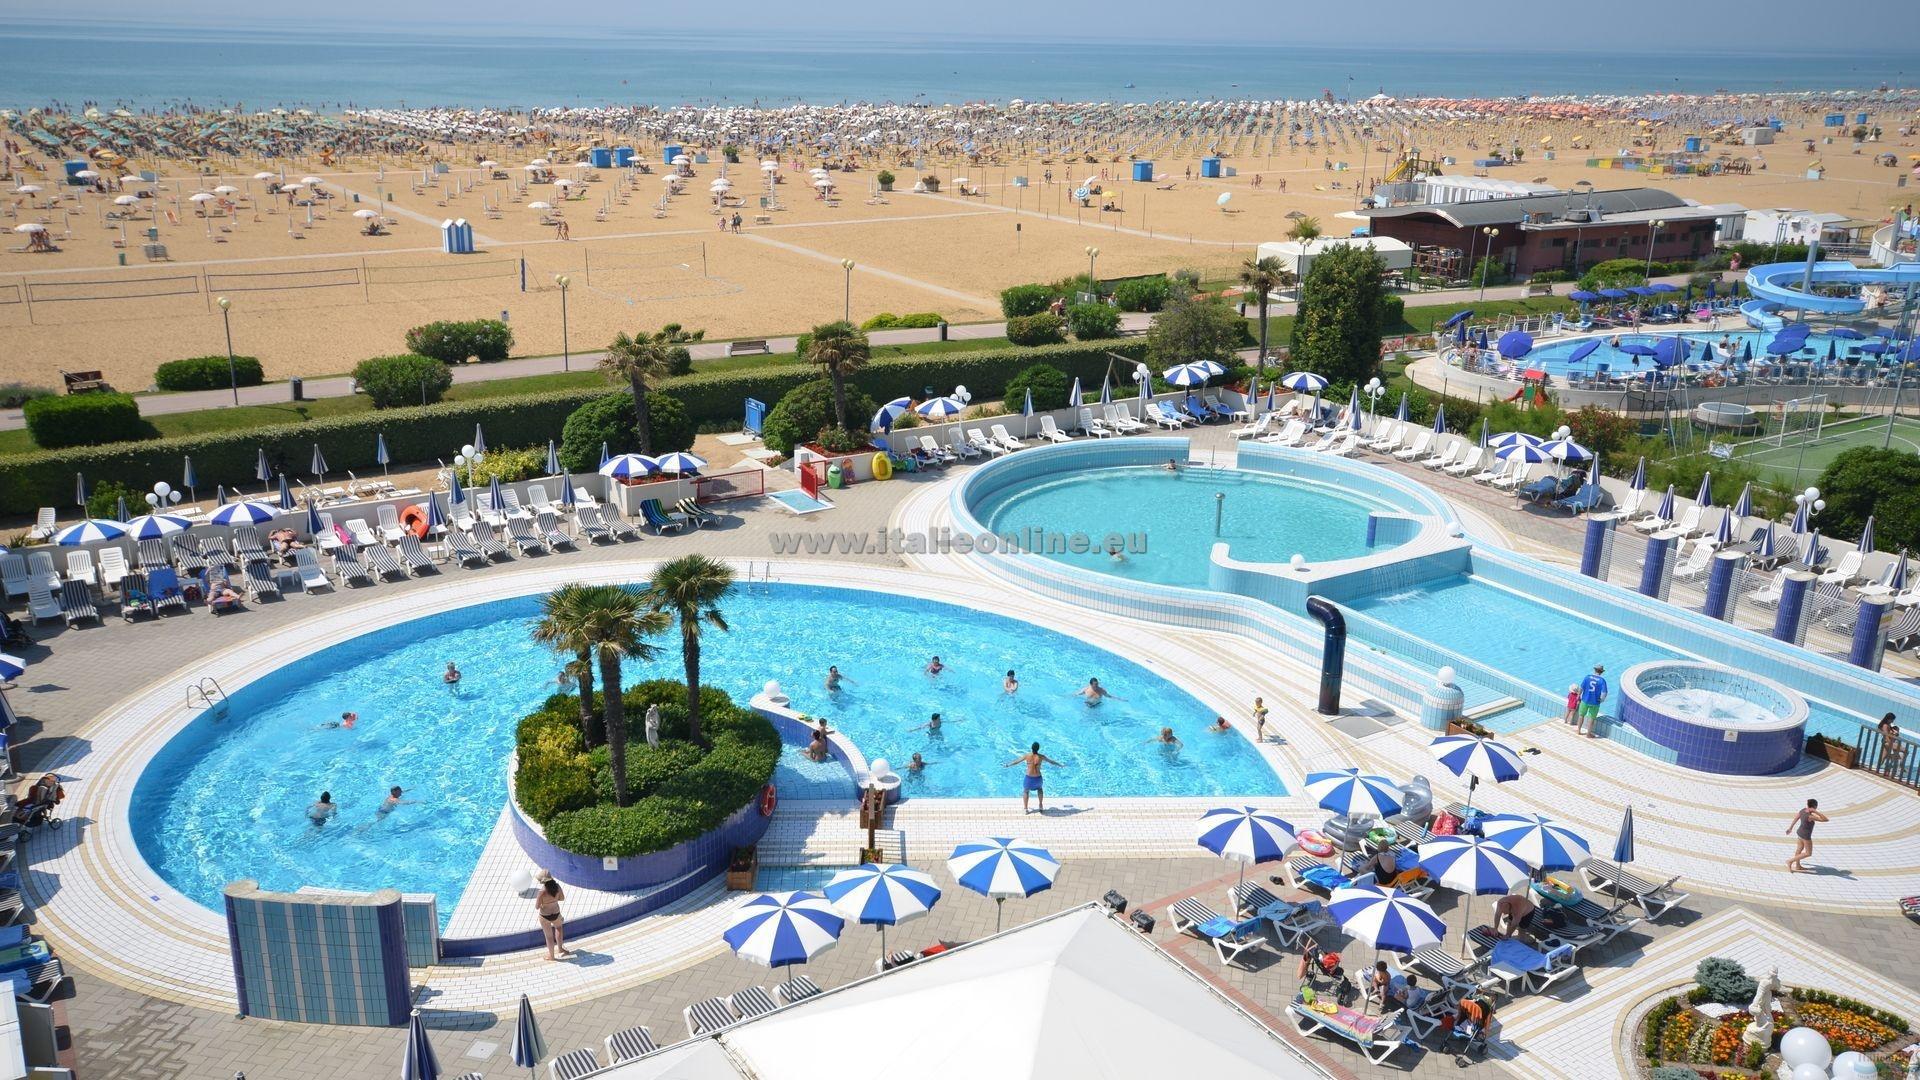 Aparthotel Imperial Bibione Spiaggia Italia Italieonline